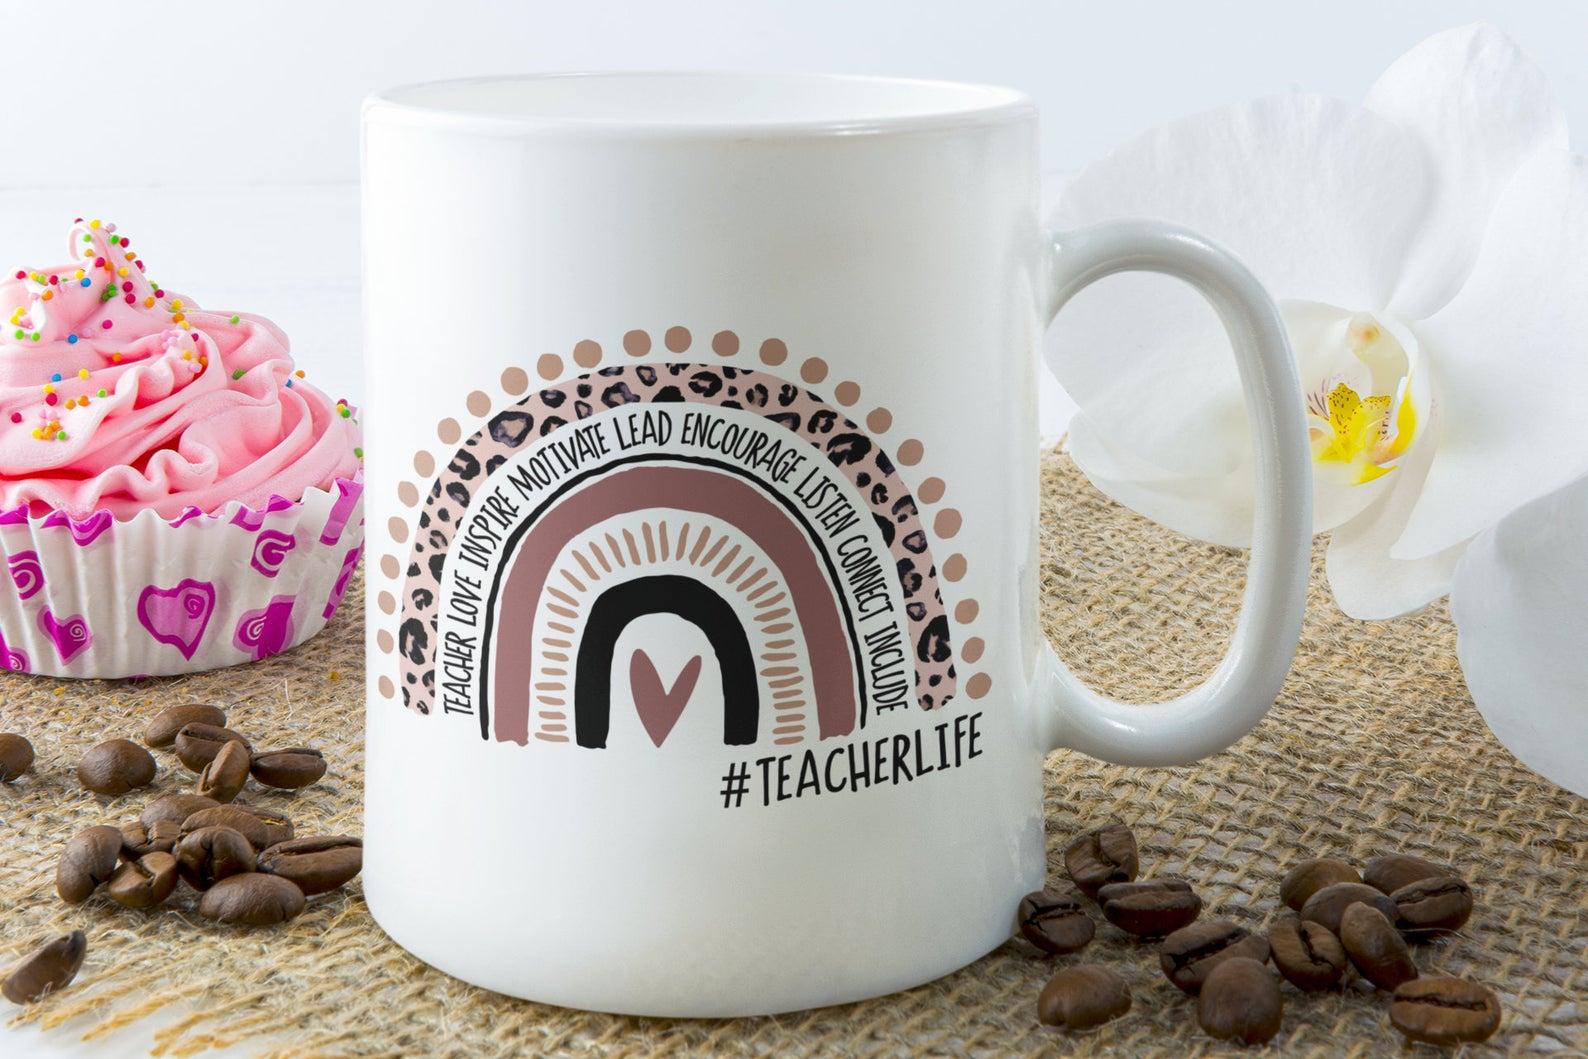 Teacher Gift Guide Ideas | Nashville Bride Guide